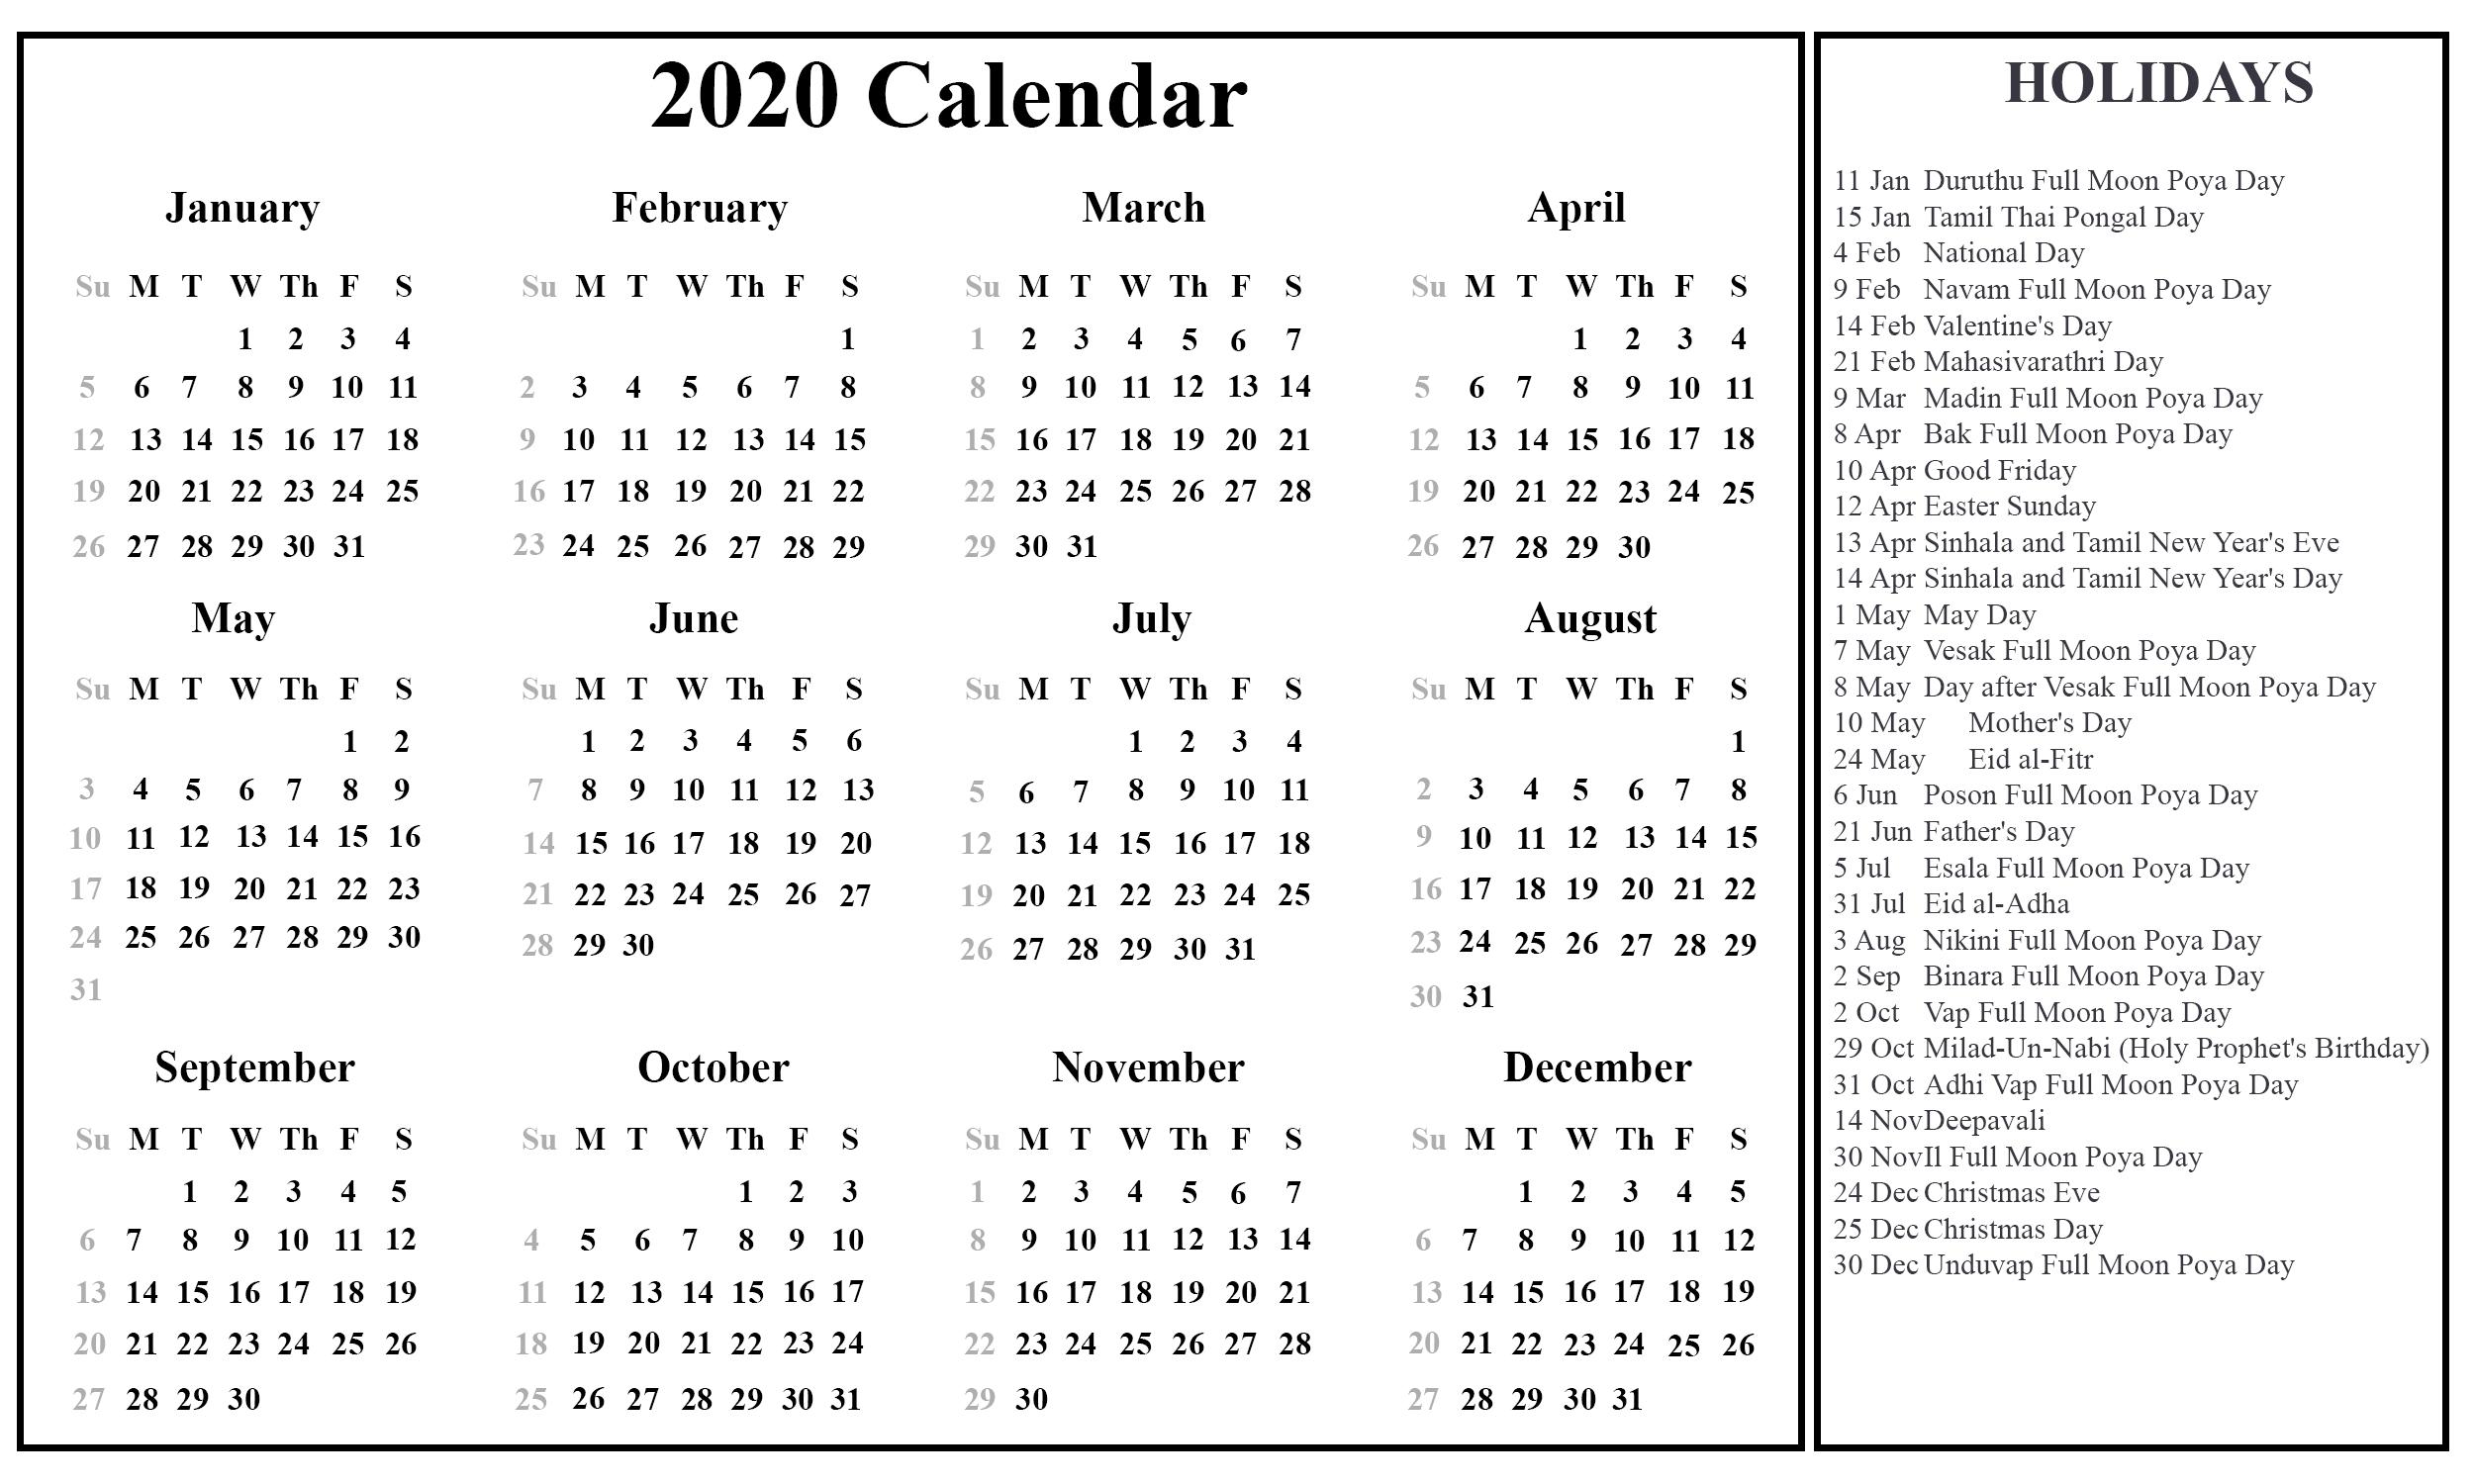 Calendar 2021 Sri Lanka Holidays | Avnitasoni-Mercantil Holidays For 2021 Sri Lanka